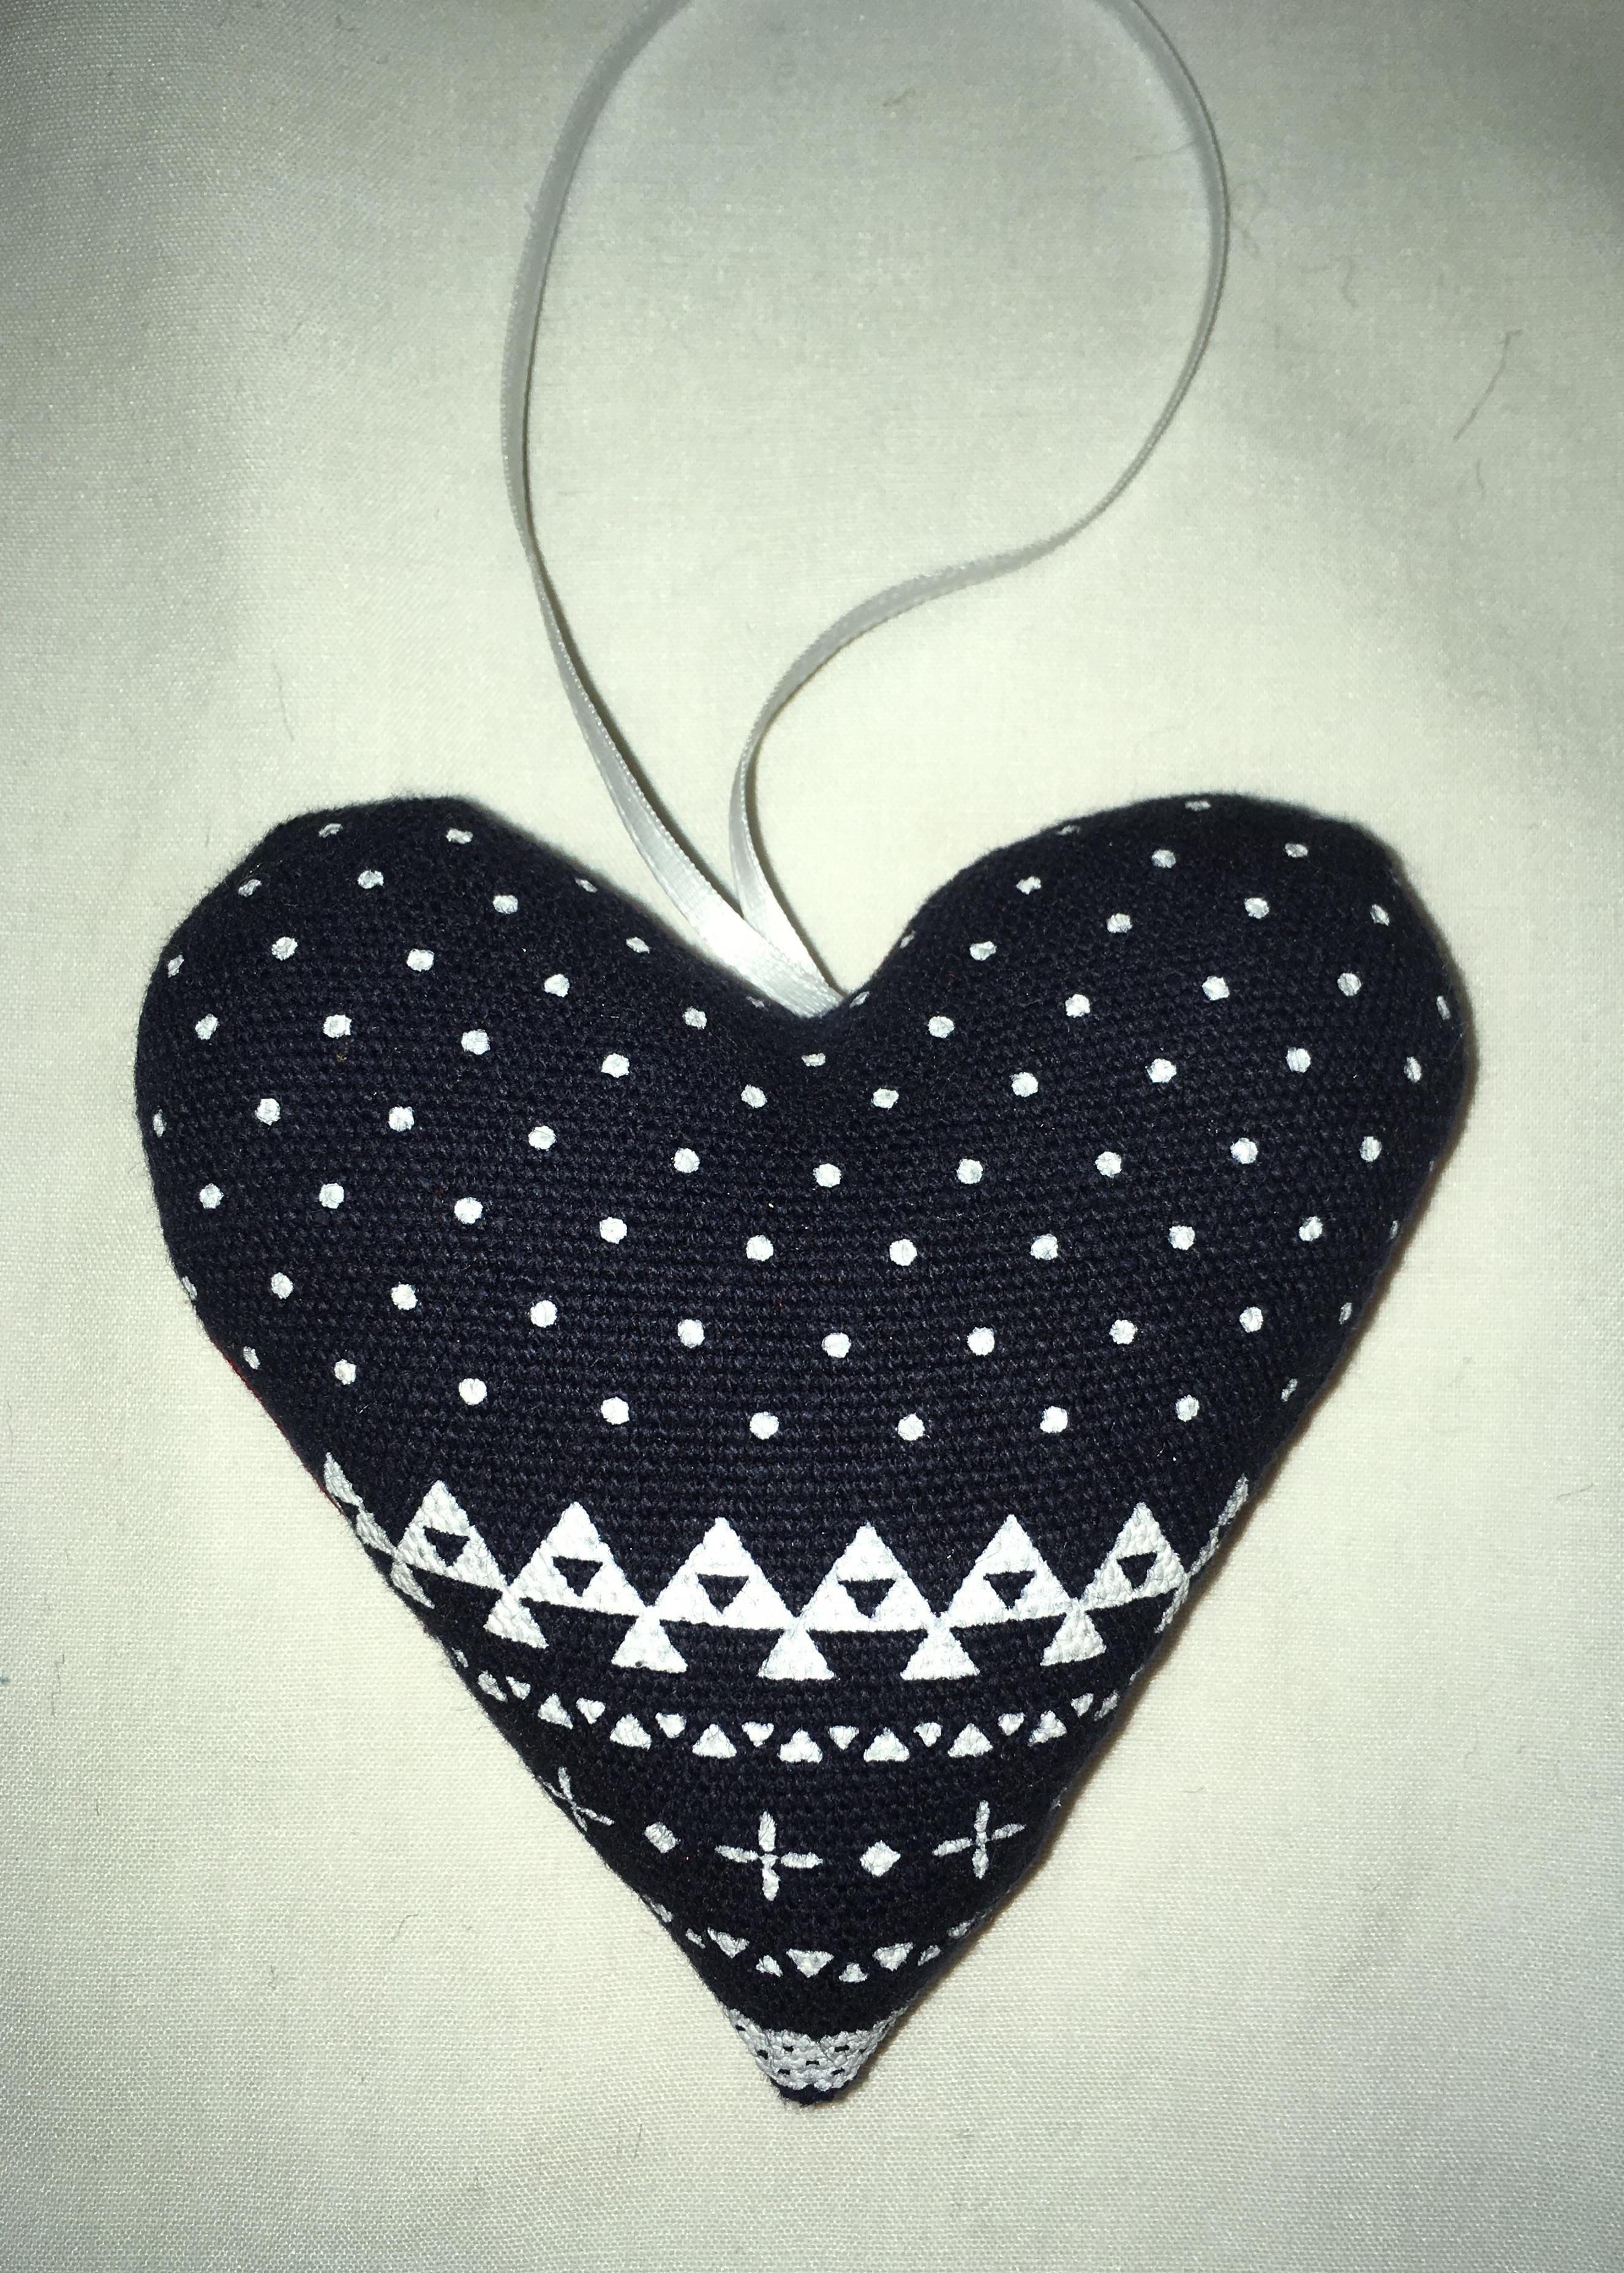 Heart Ornament 005